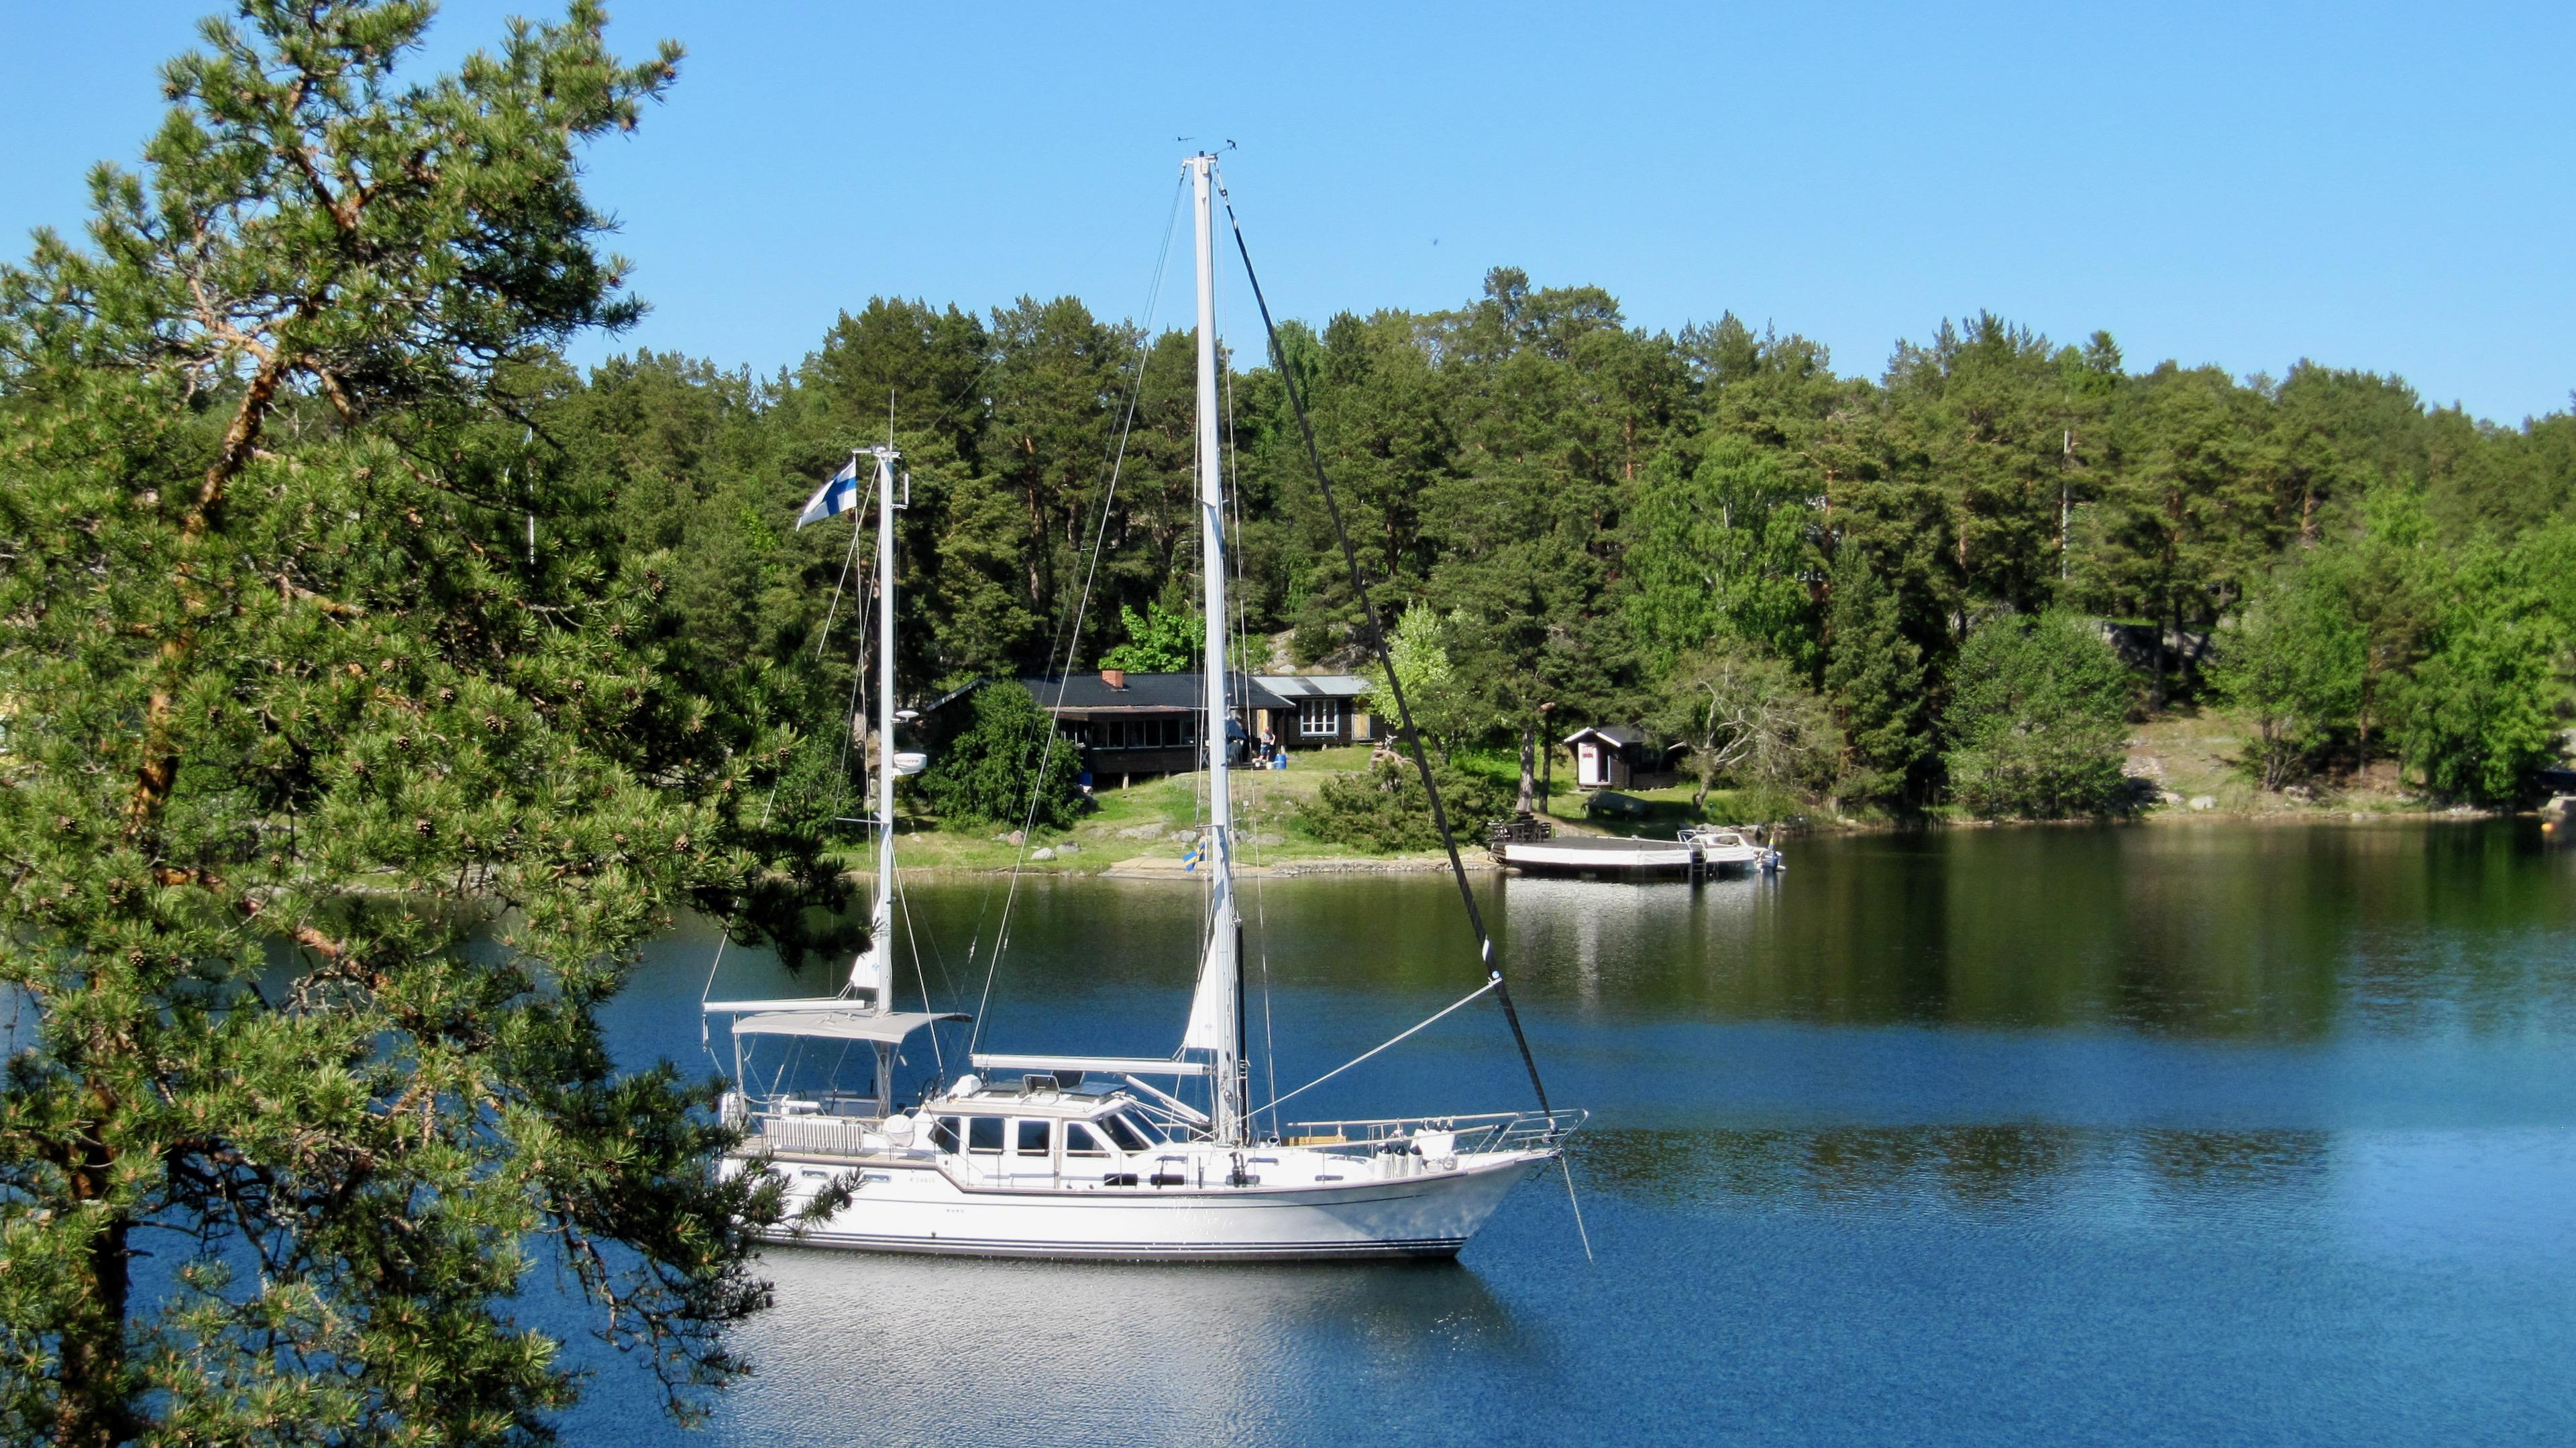 Suwena anchored in the lagoon of Lådna